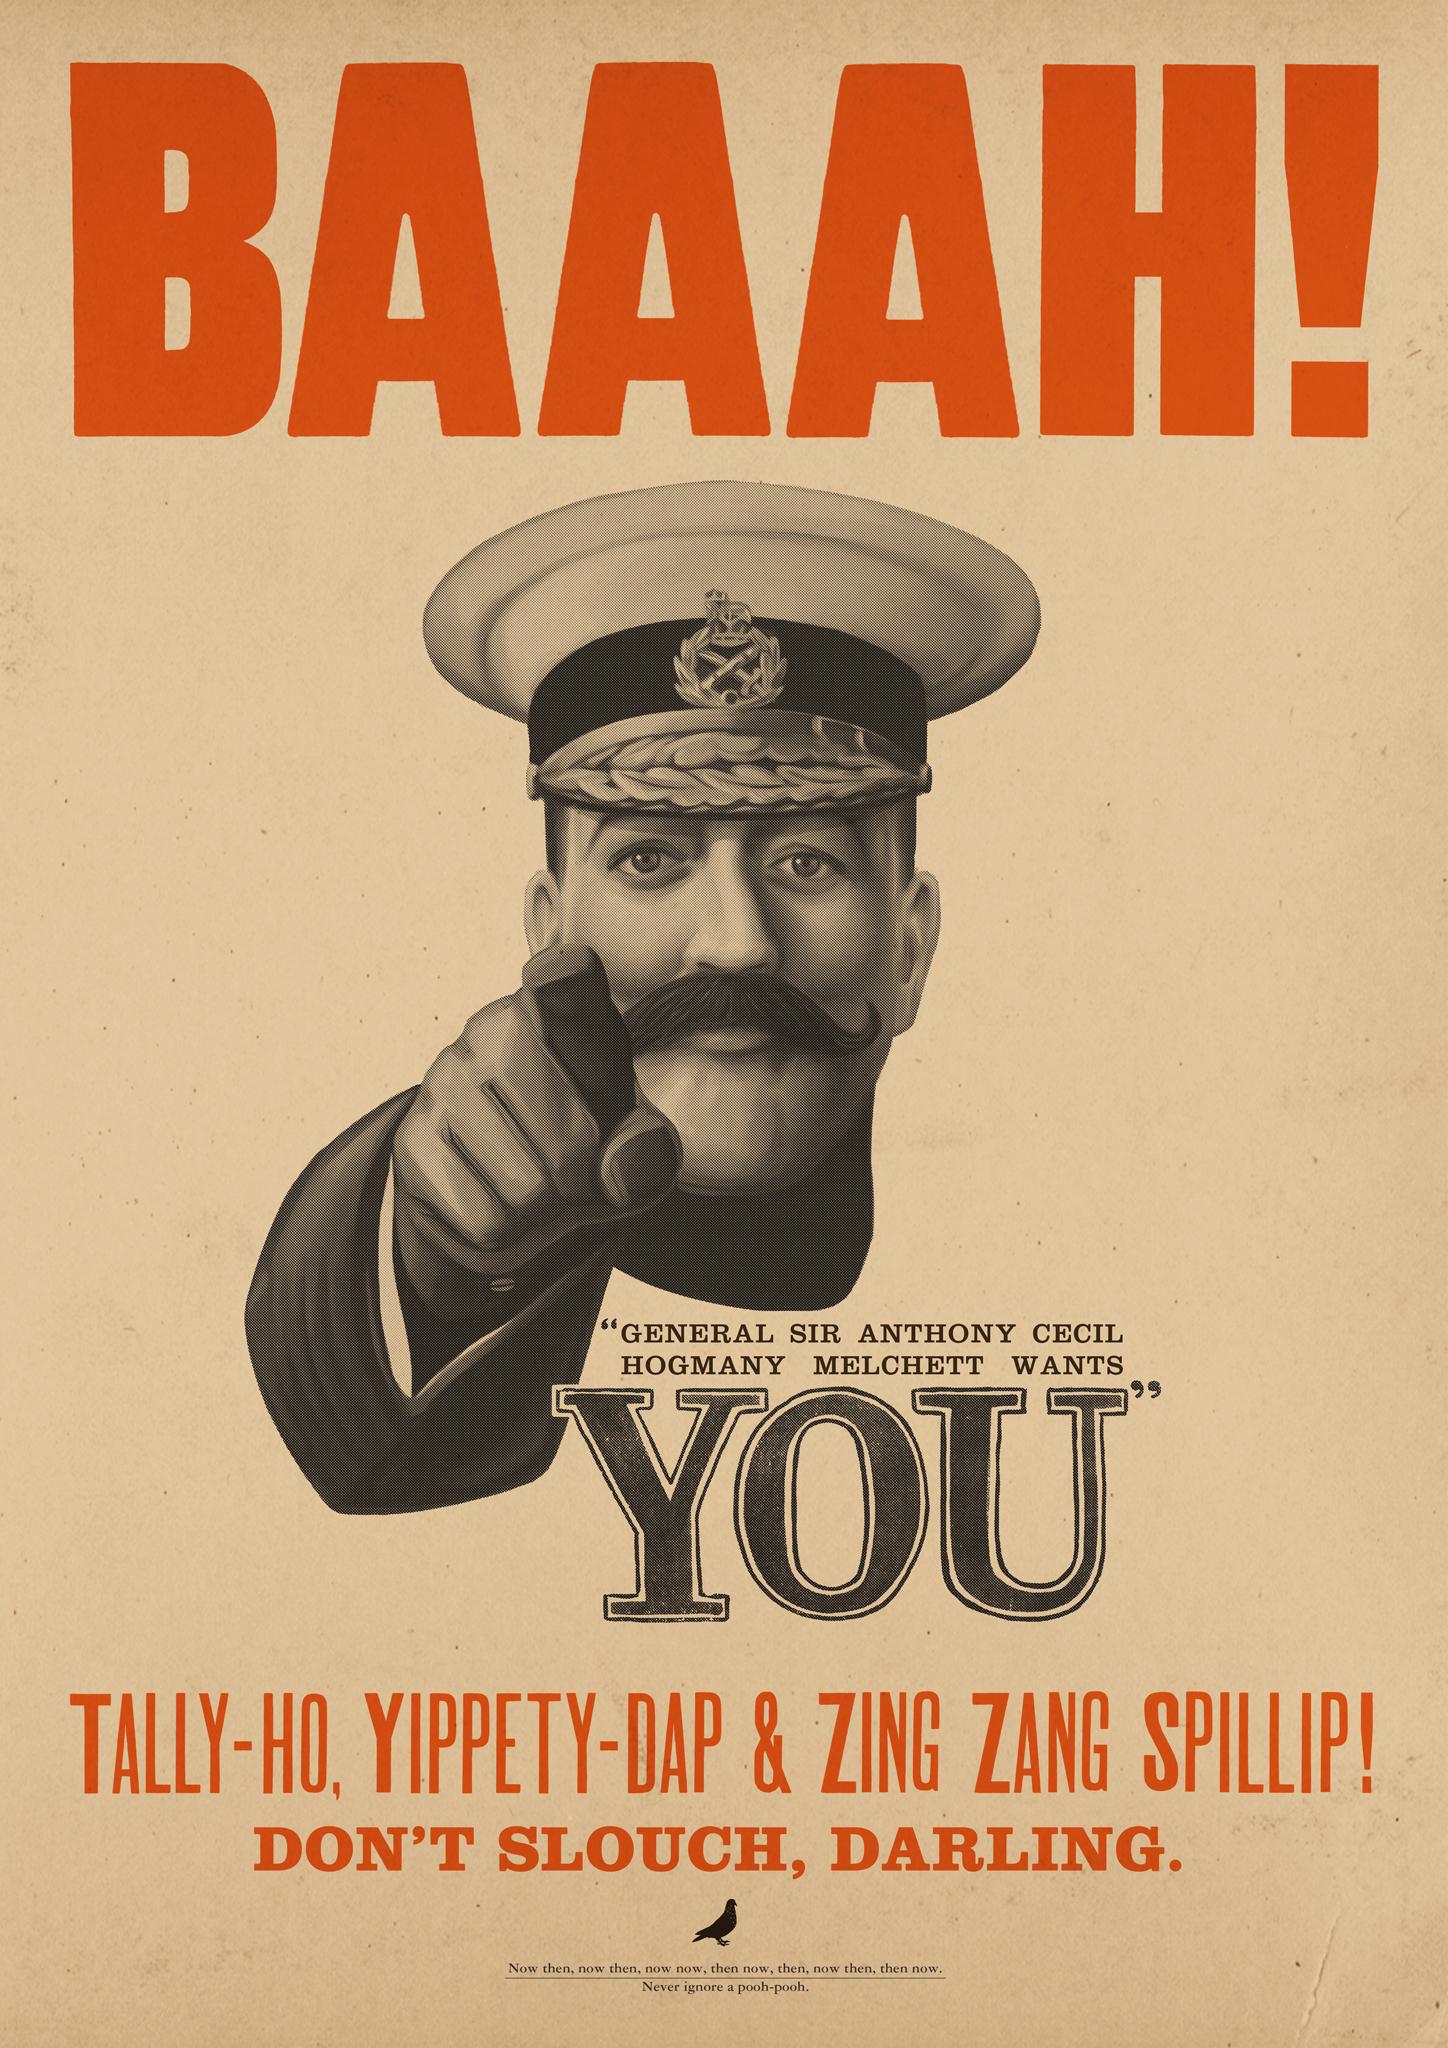 General Melchett Wants You!